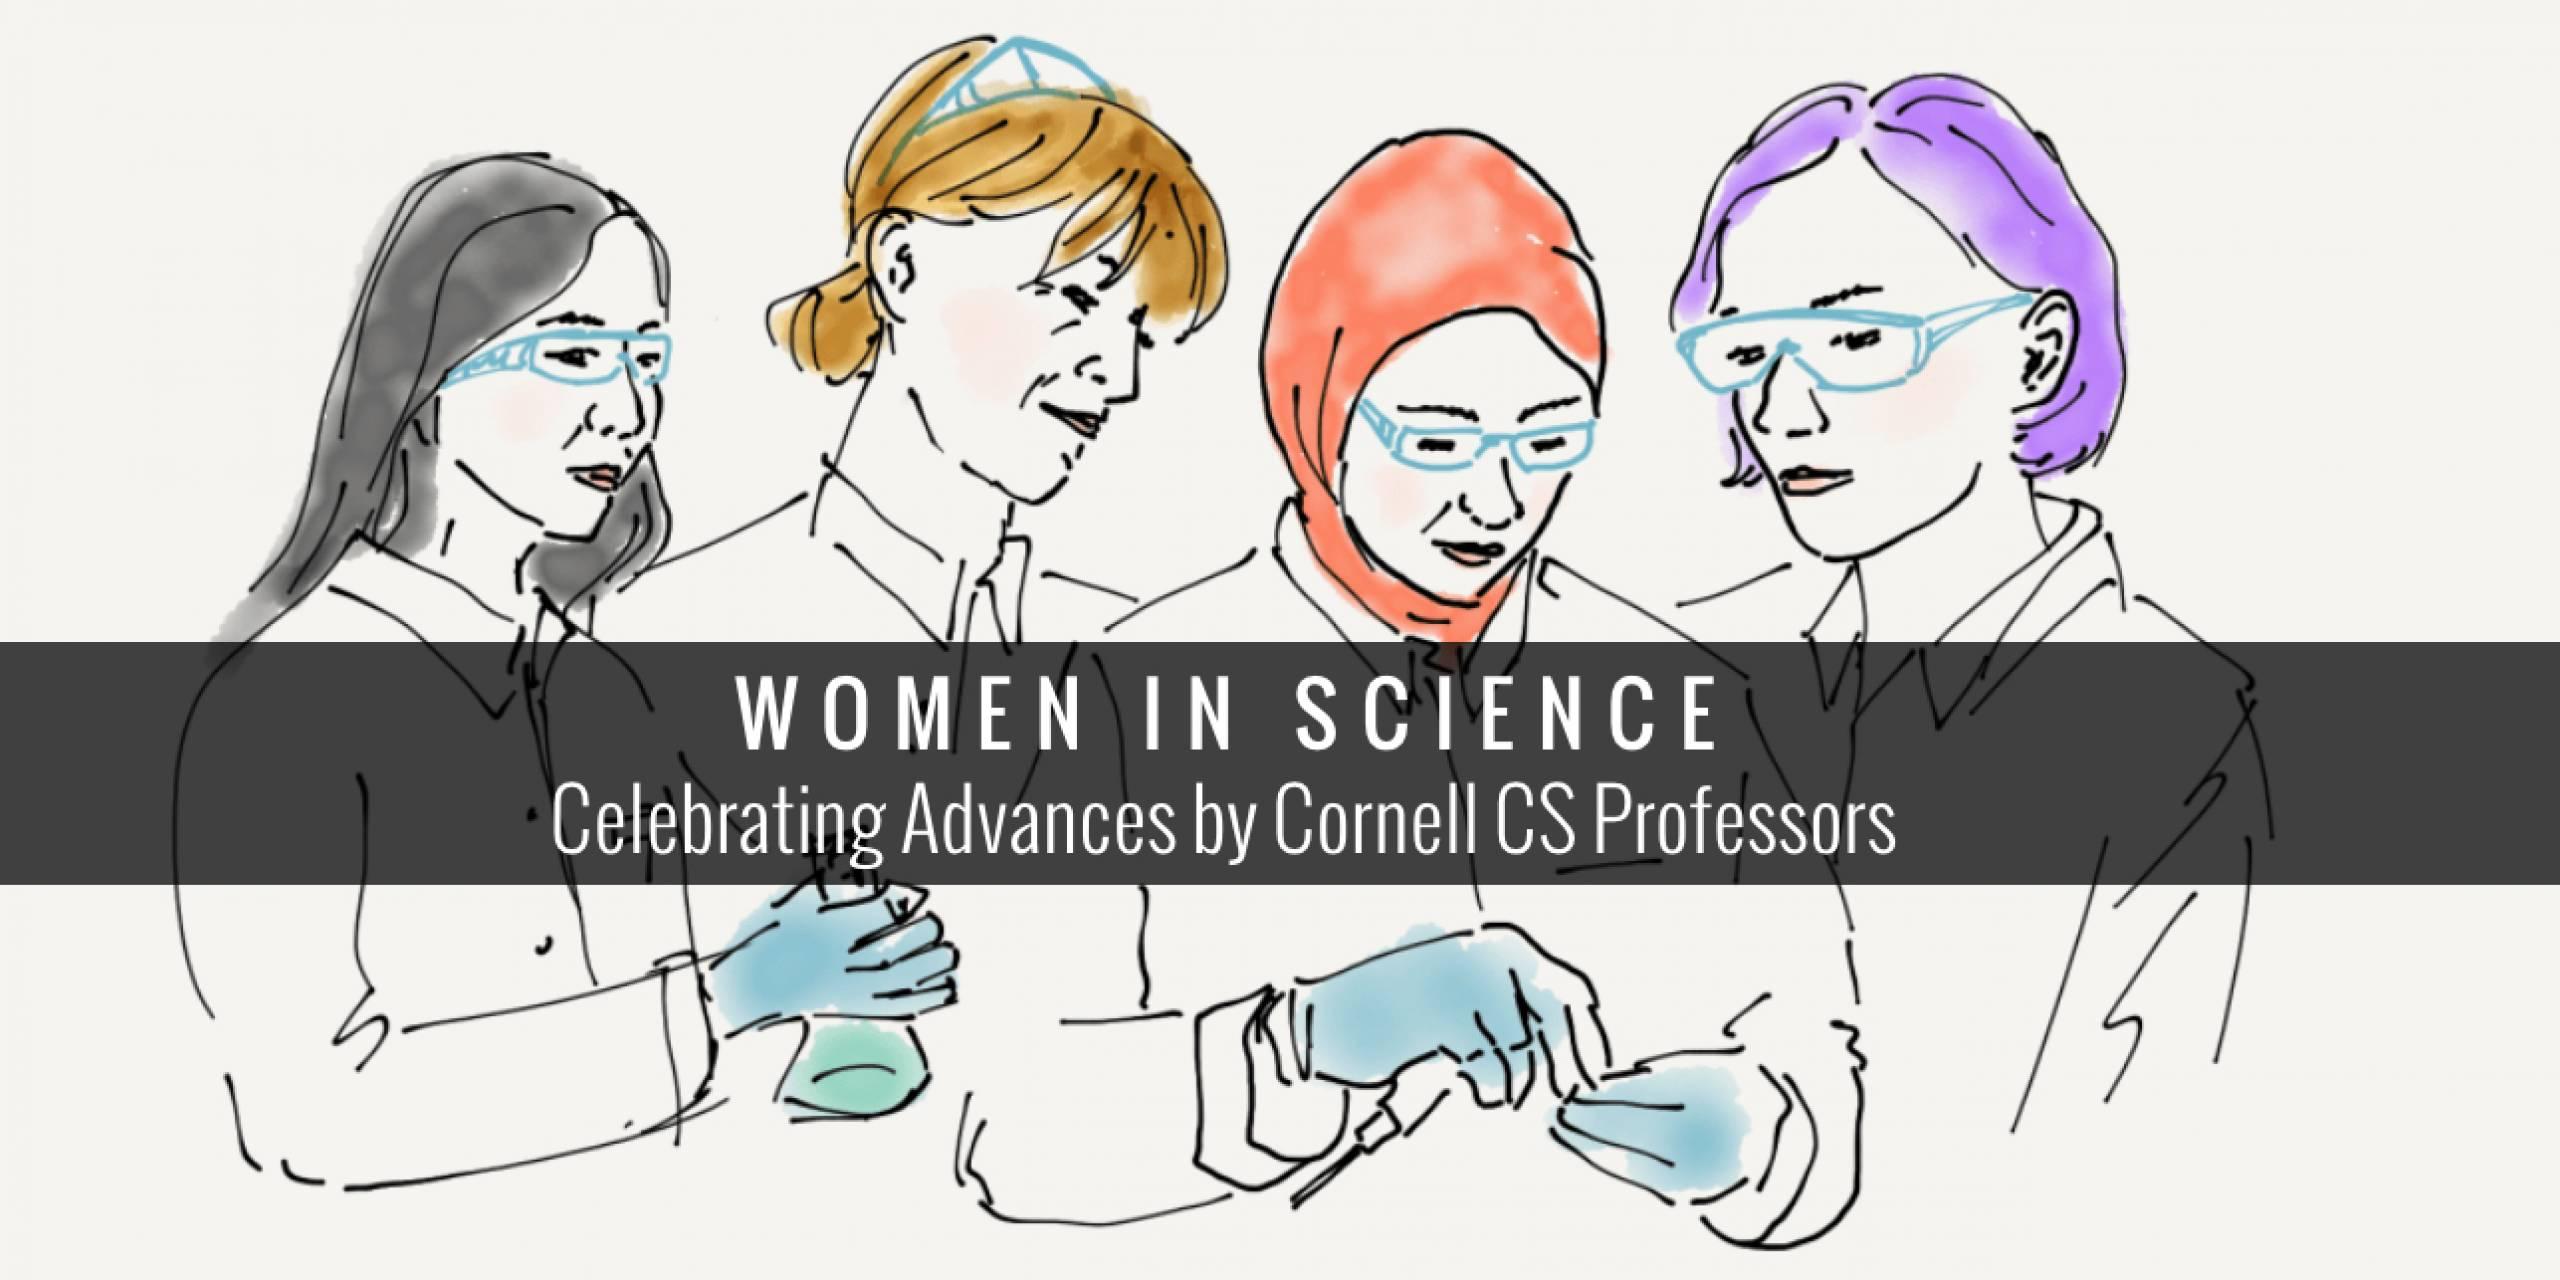 Women in Science: Celebrating Advances by Cornell CS Professors